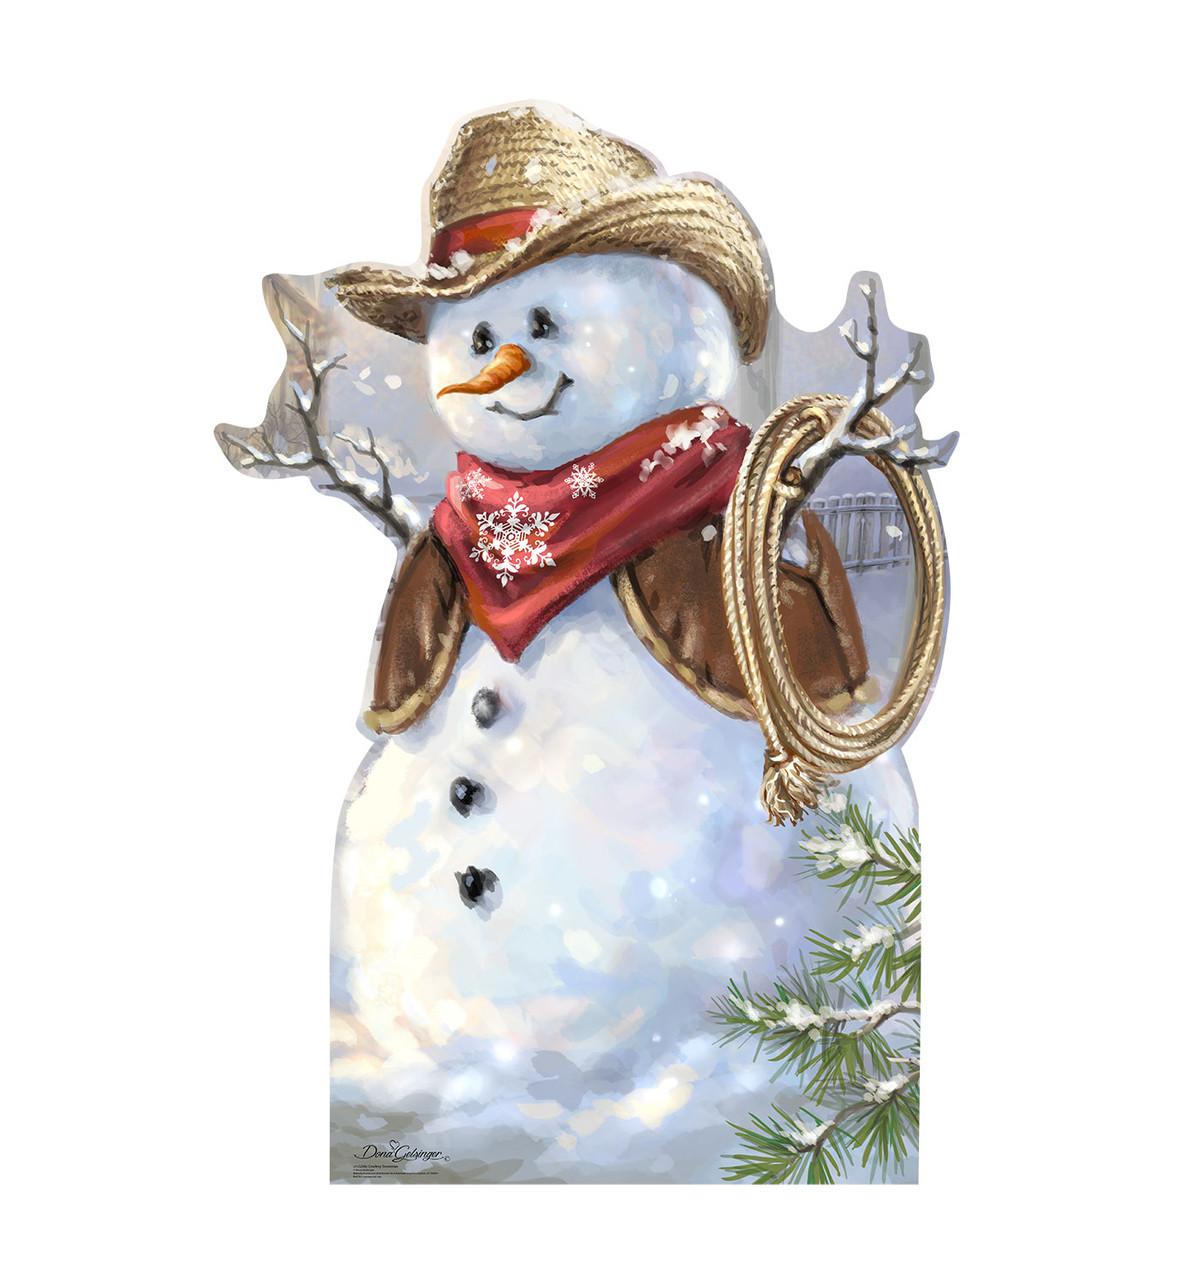 Cowboy Snowman Cardboard Cutout 2112